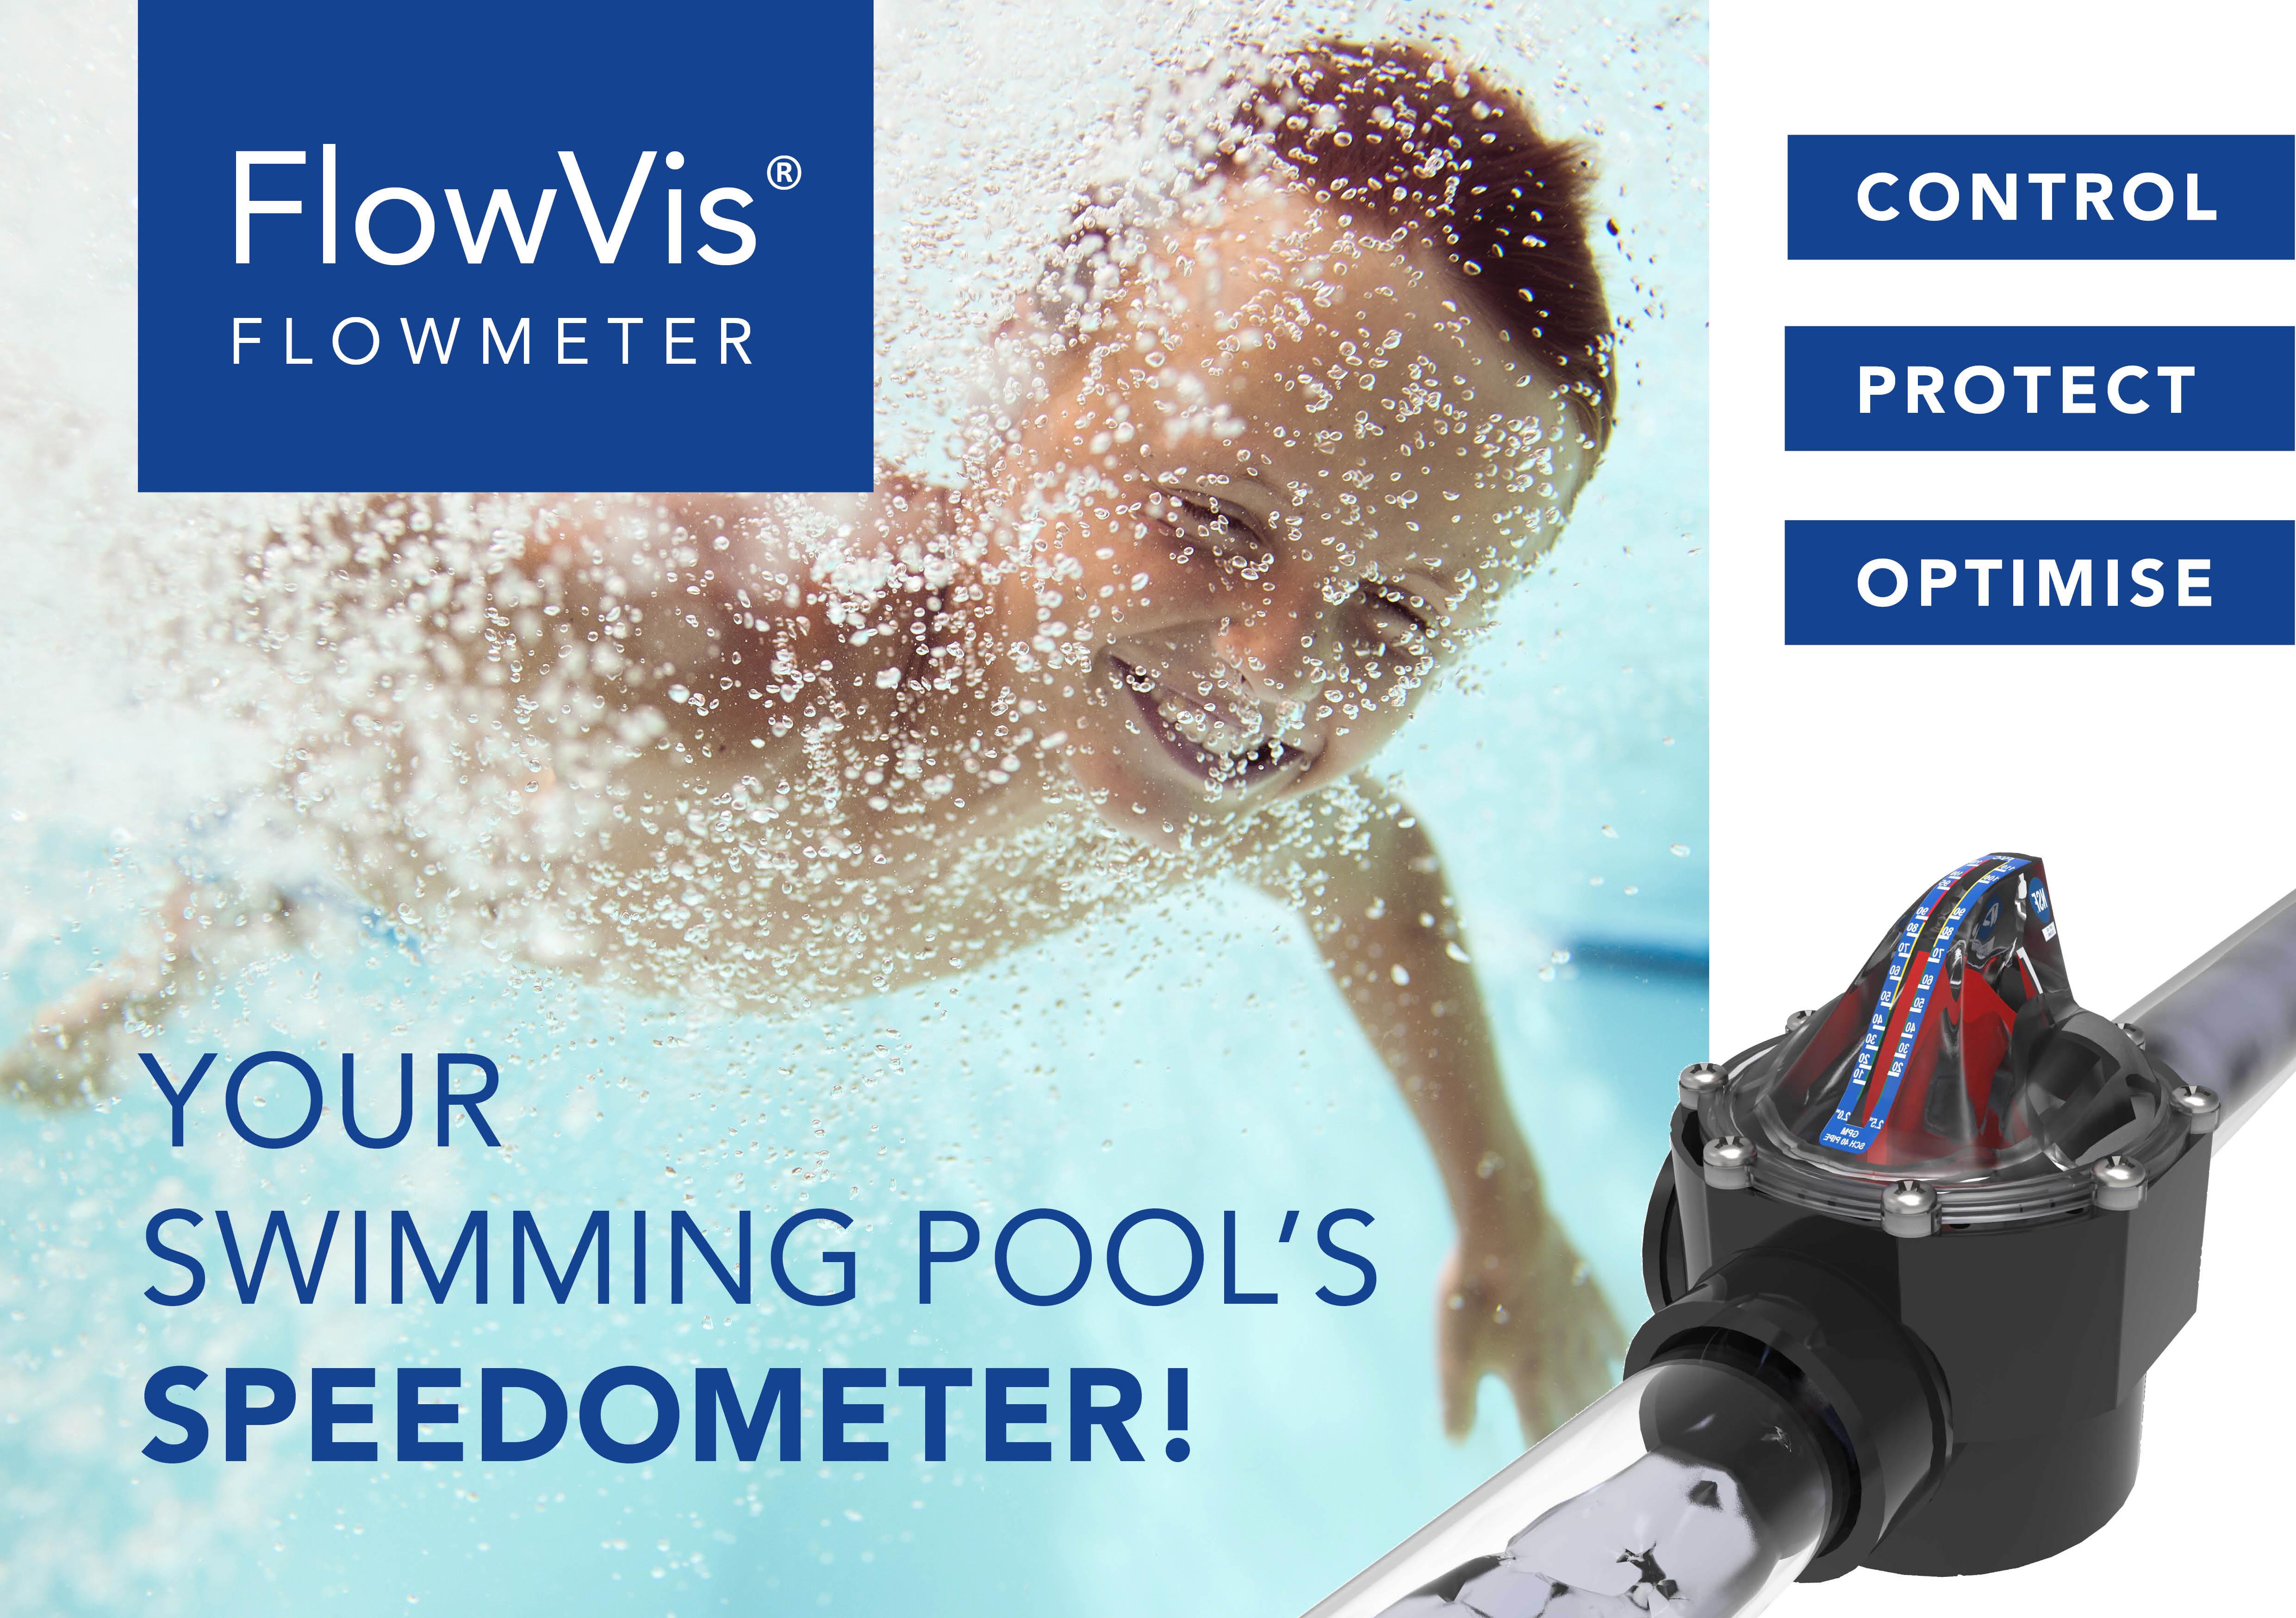 FlowVis A5 Advert English